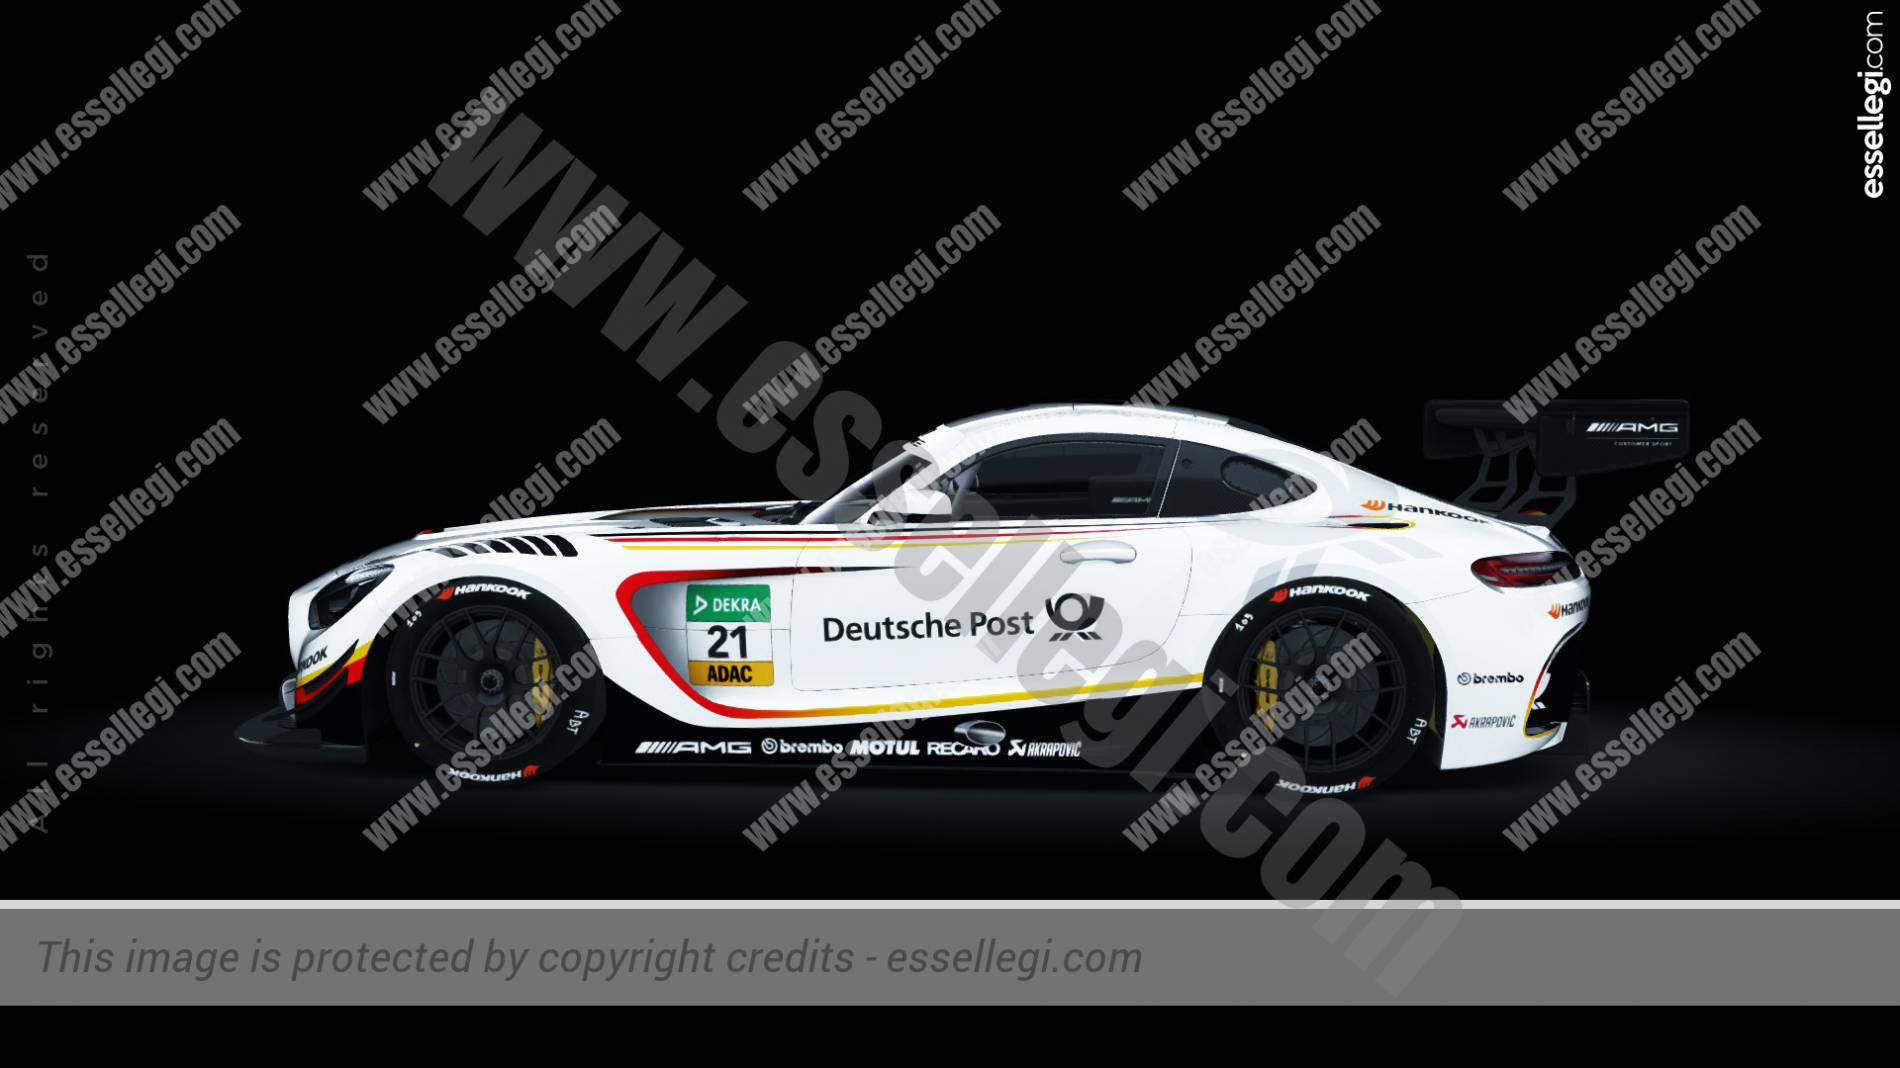 Mercedes AMG GT3 Deutsche Post Tribute Racing Car Livery